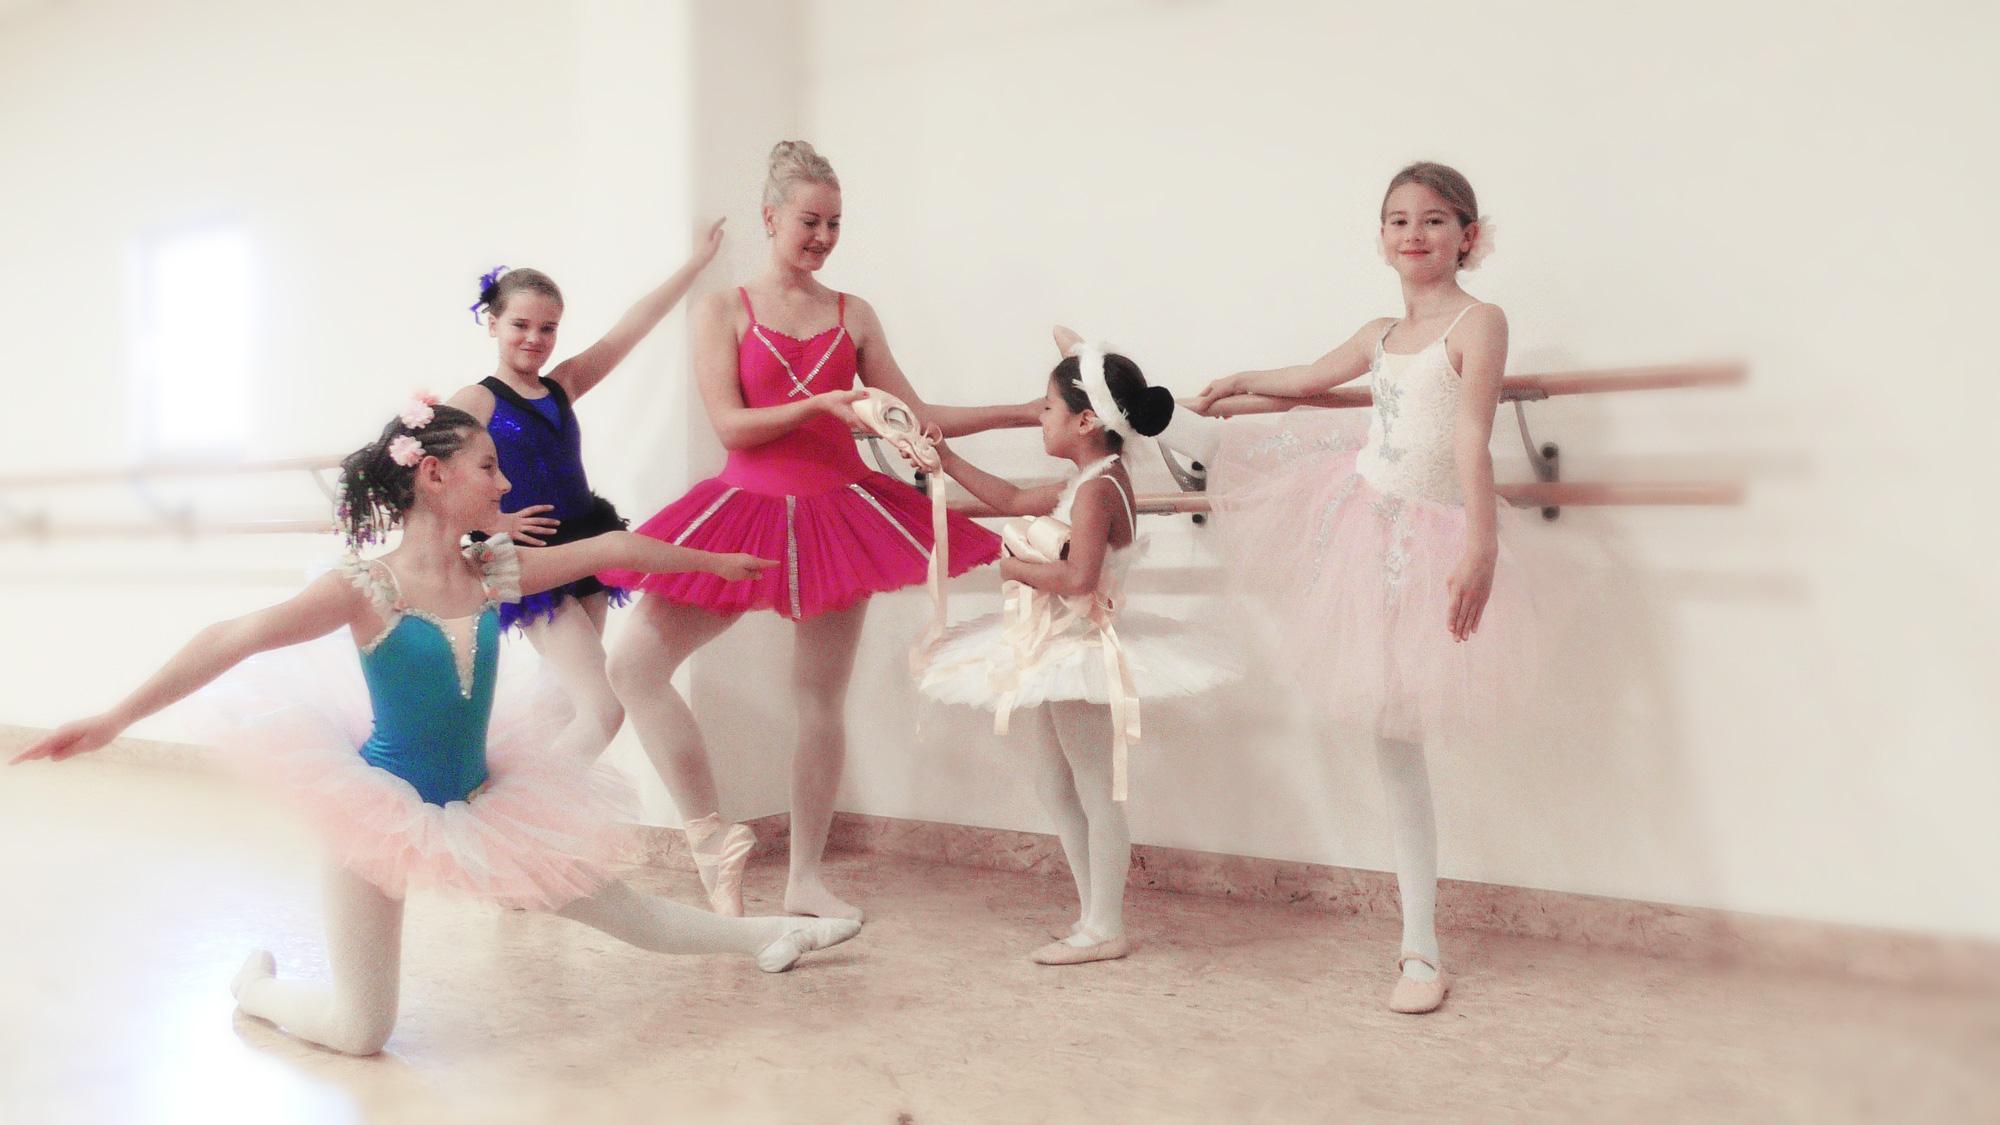 Ballettschule Lelia Fischer - Kurse